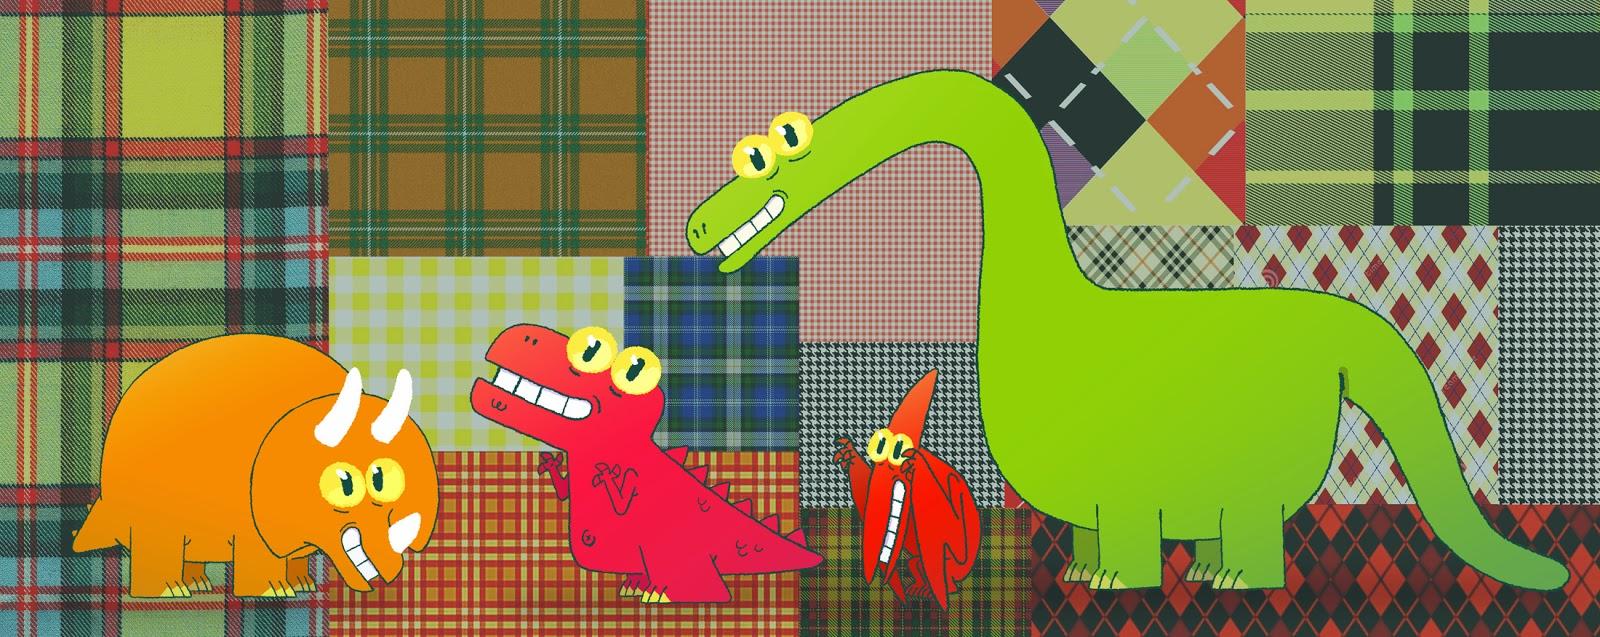 dinosaurs © Juin 2014